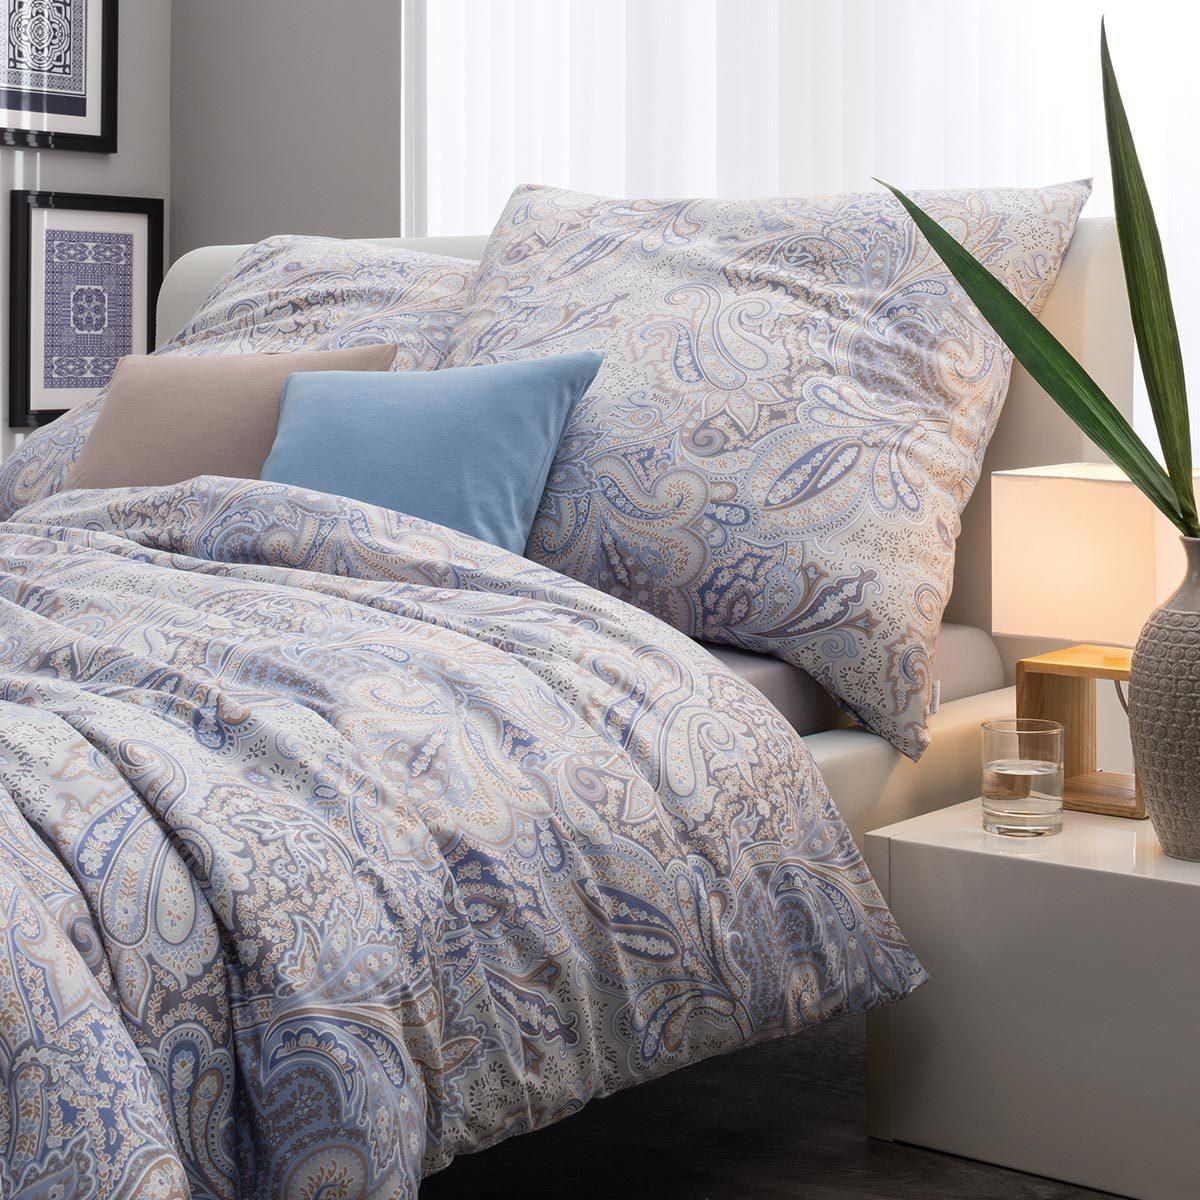 estella mako interlock jersey yaren taube g nstig online. Black Bedroom Furniture Sets. Home Design Ideas